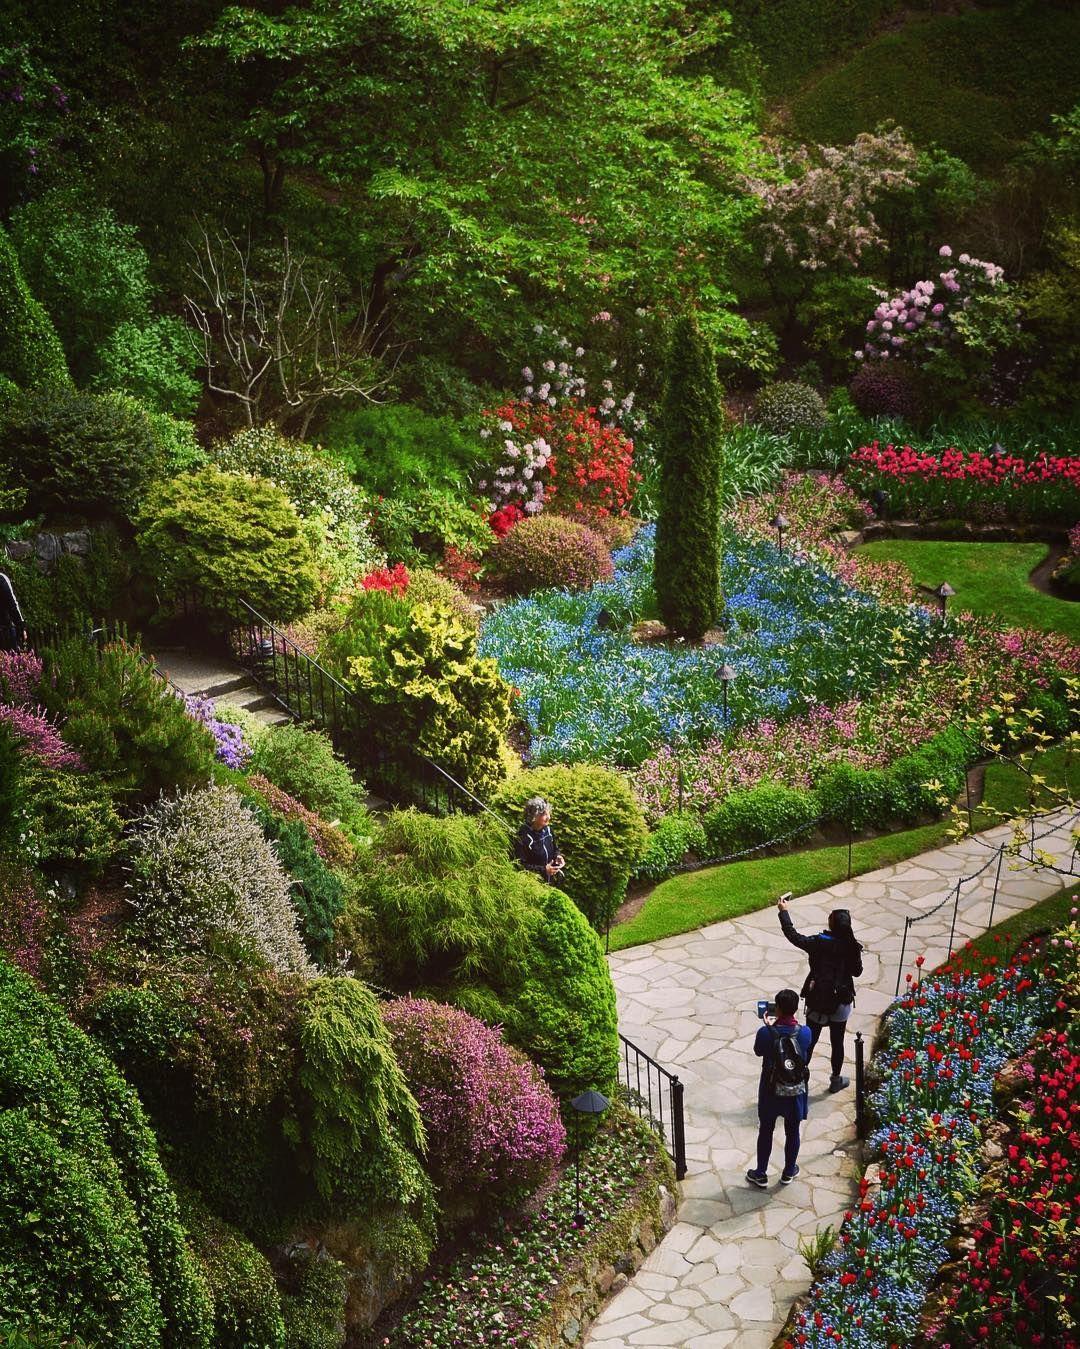 Butchart Gardens (Victoria, BC) by ArtofGardening.org (@jimcharlier) on Instagram